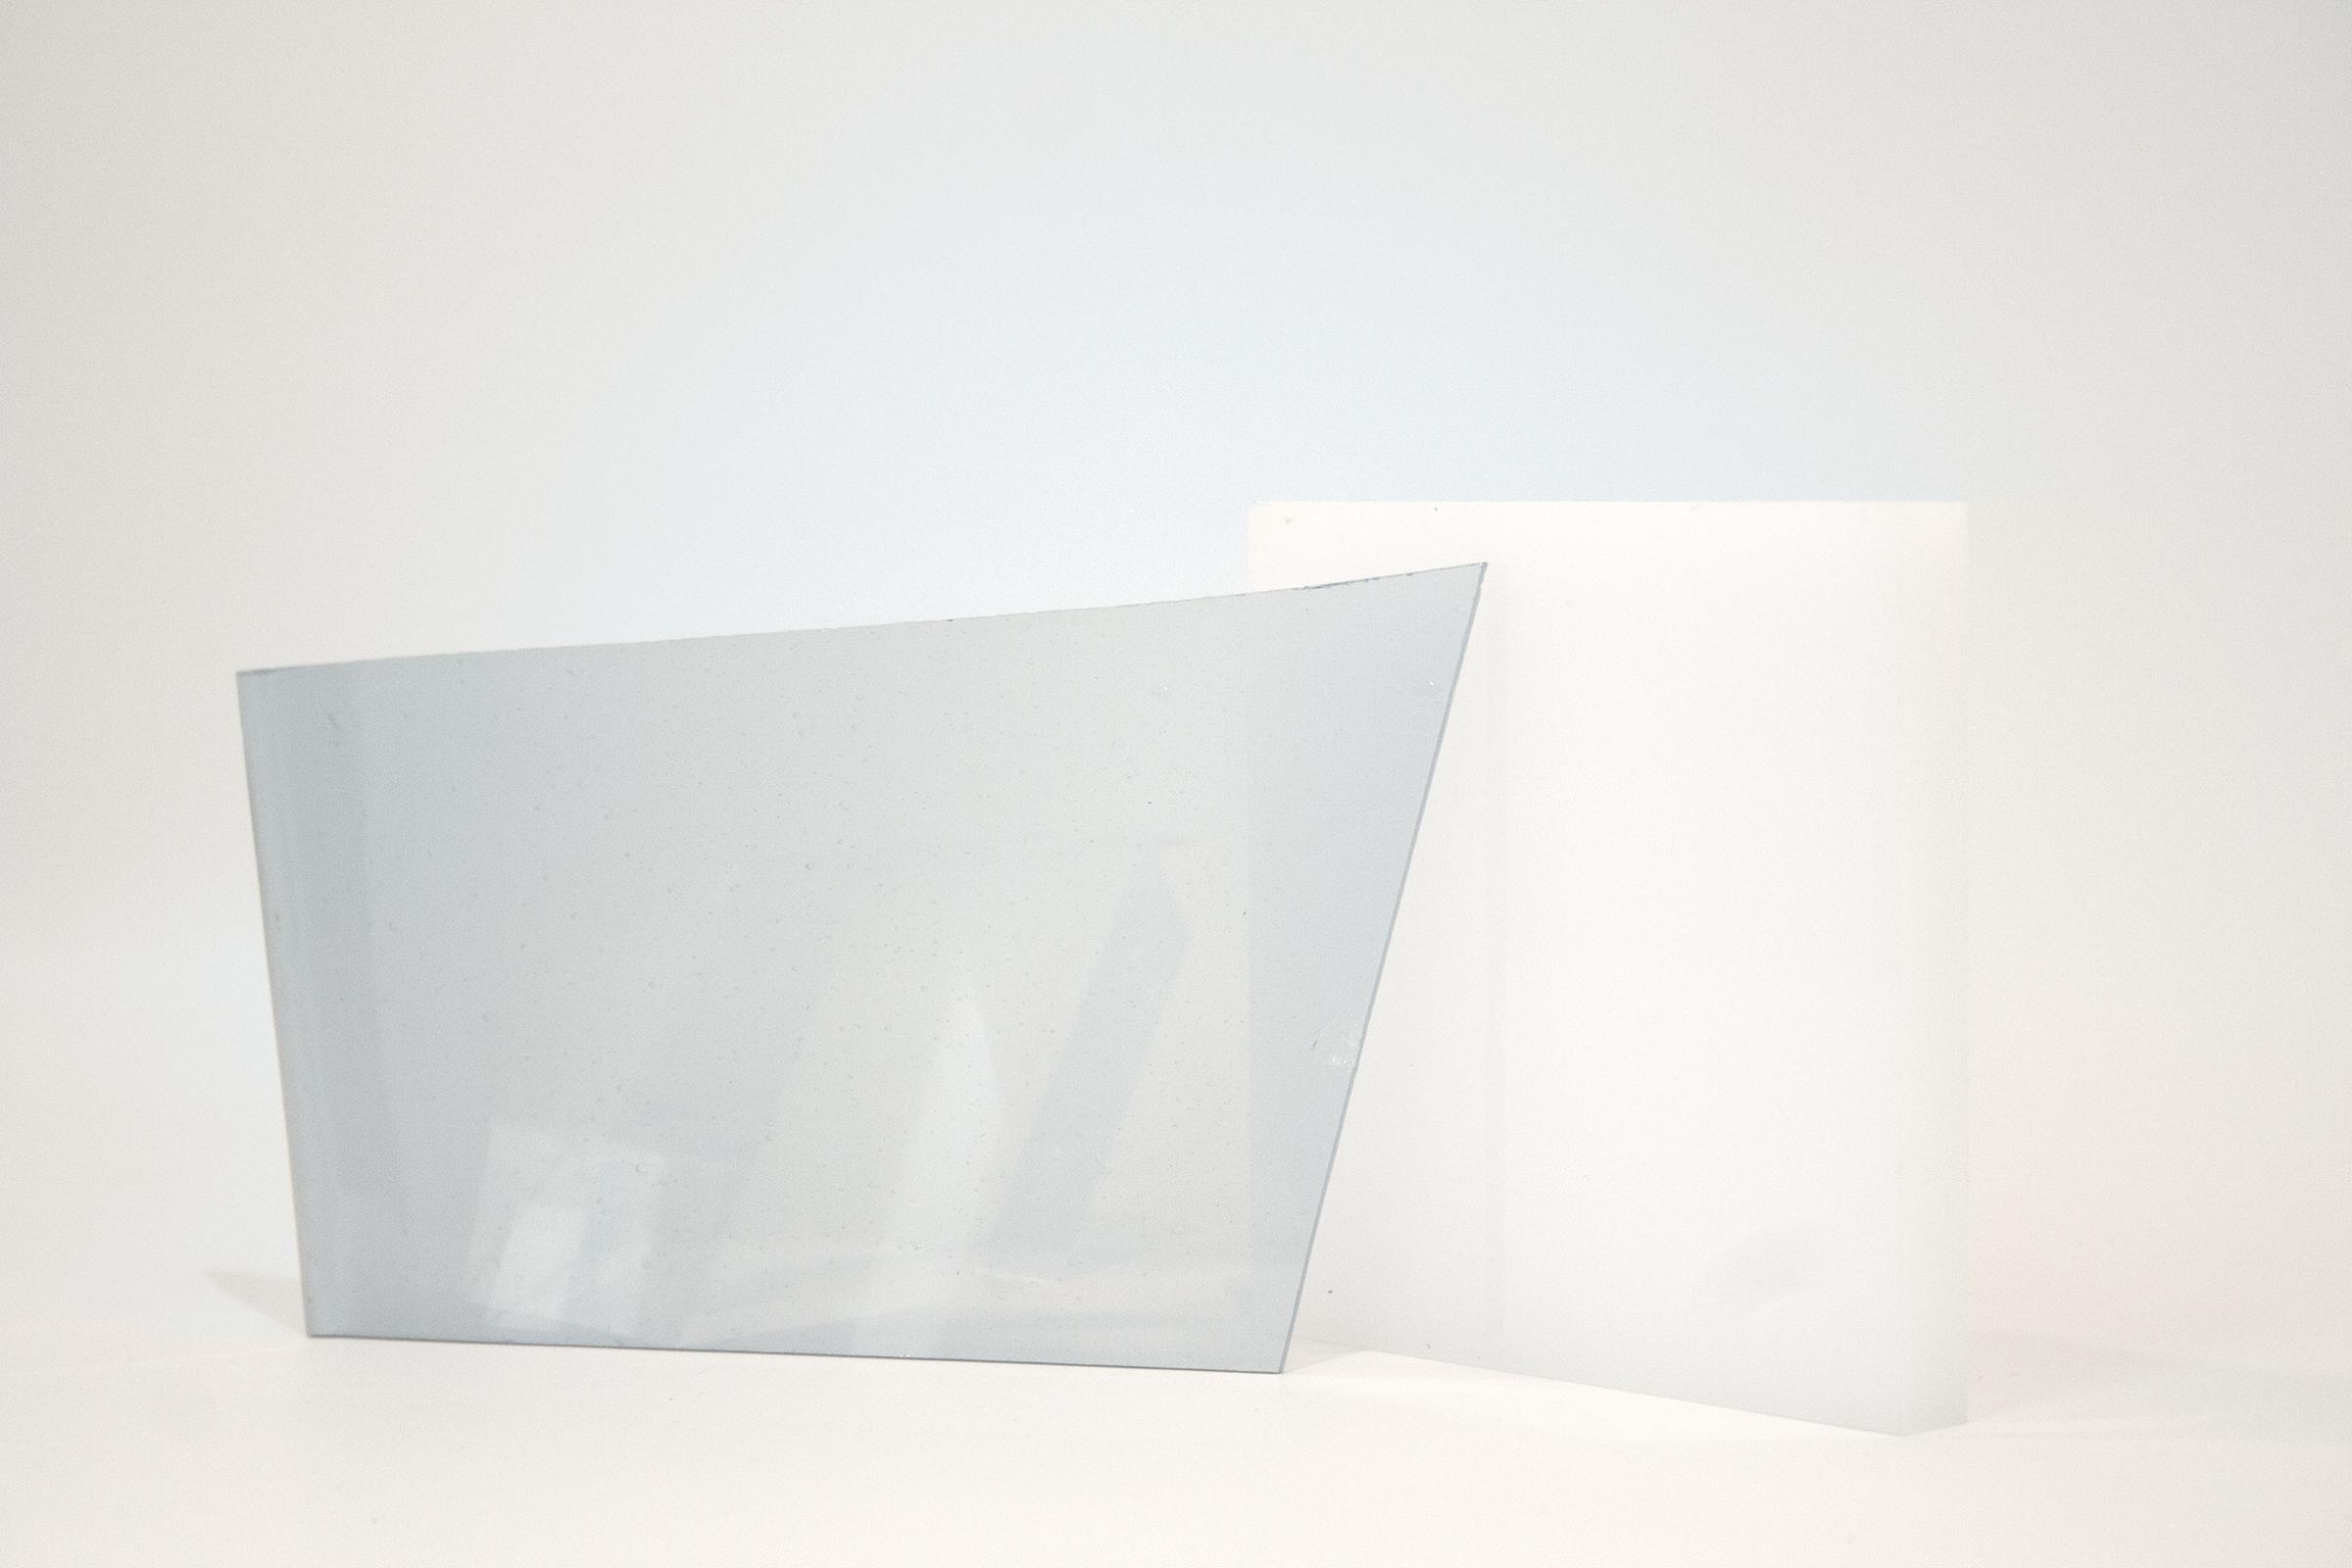 "Hiding Behind Blue   Archival inkjet print  4"" x 6""  2017"